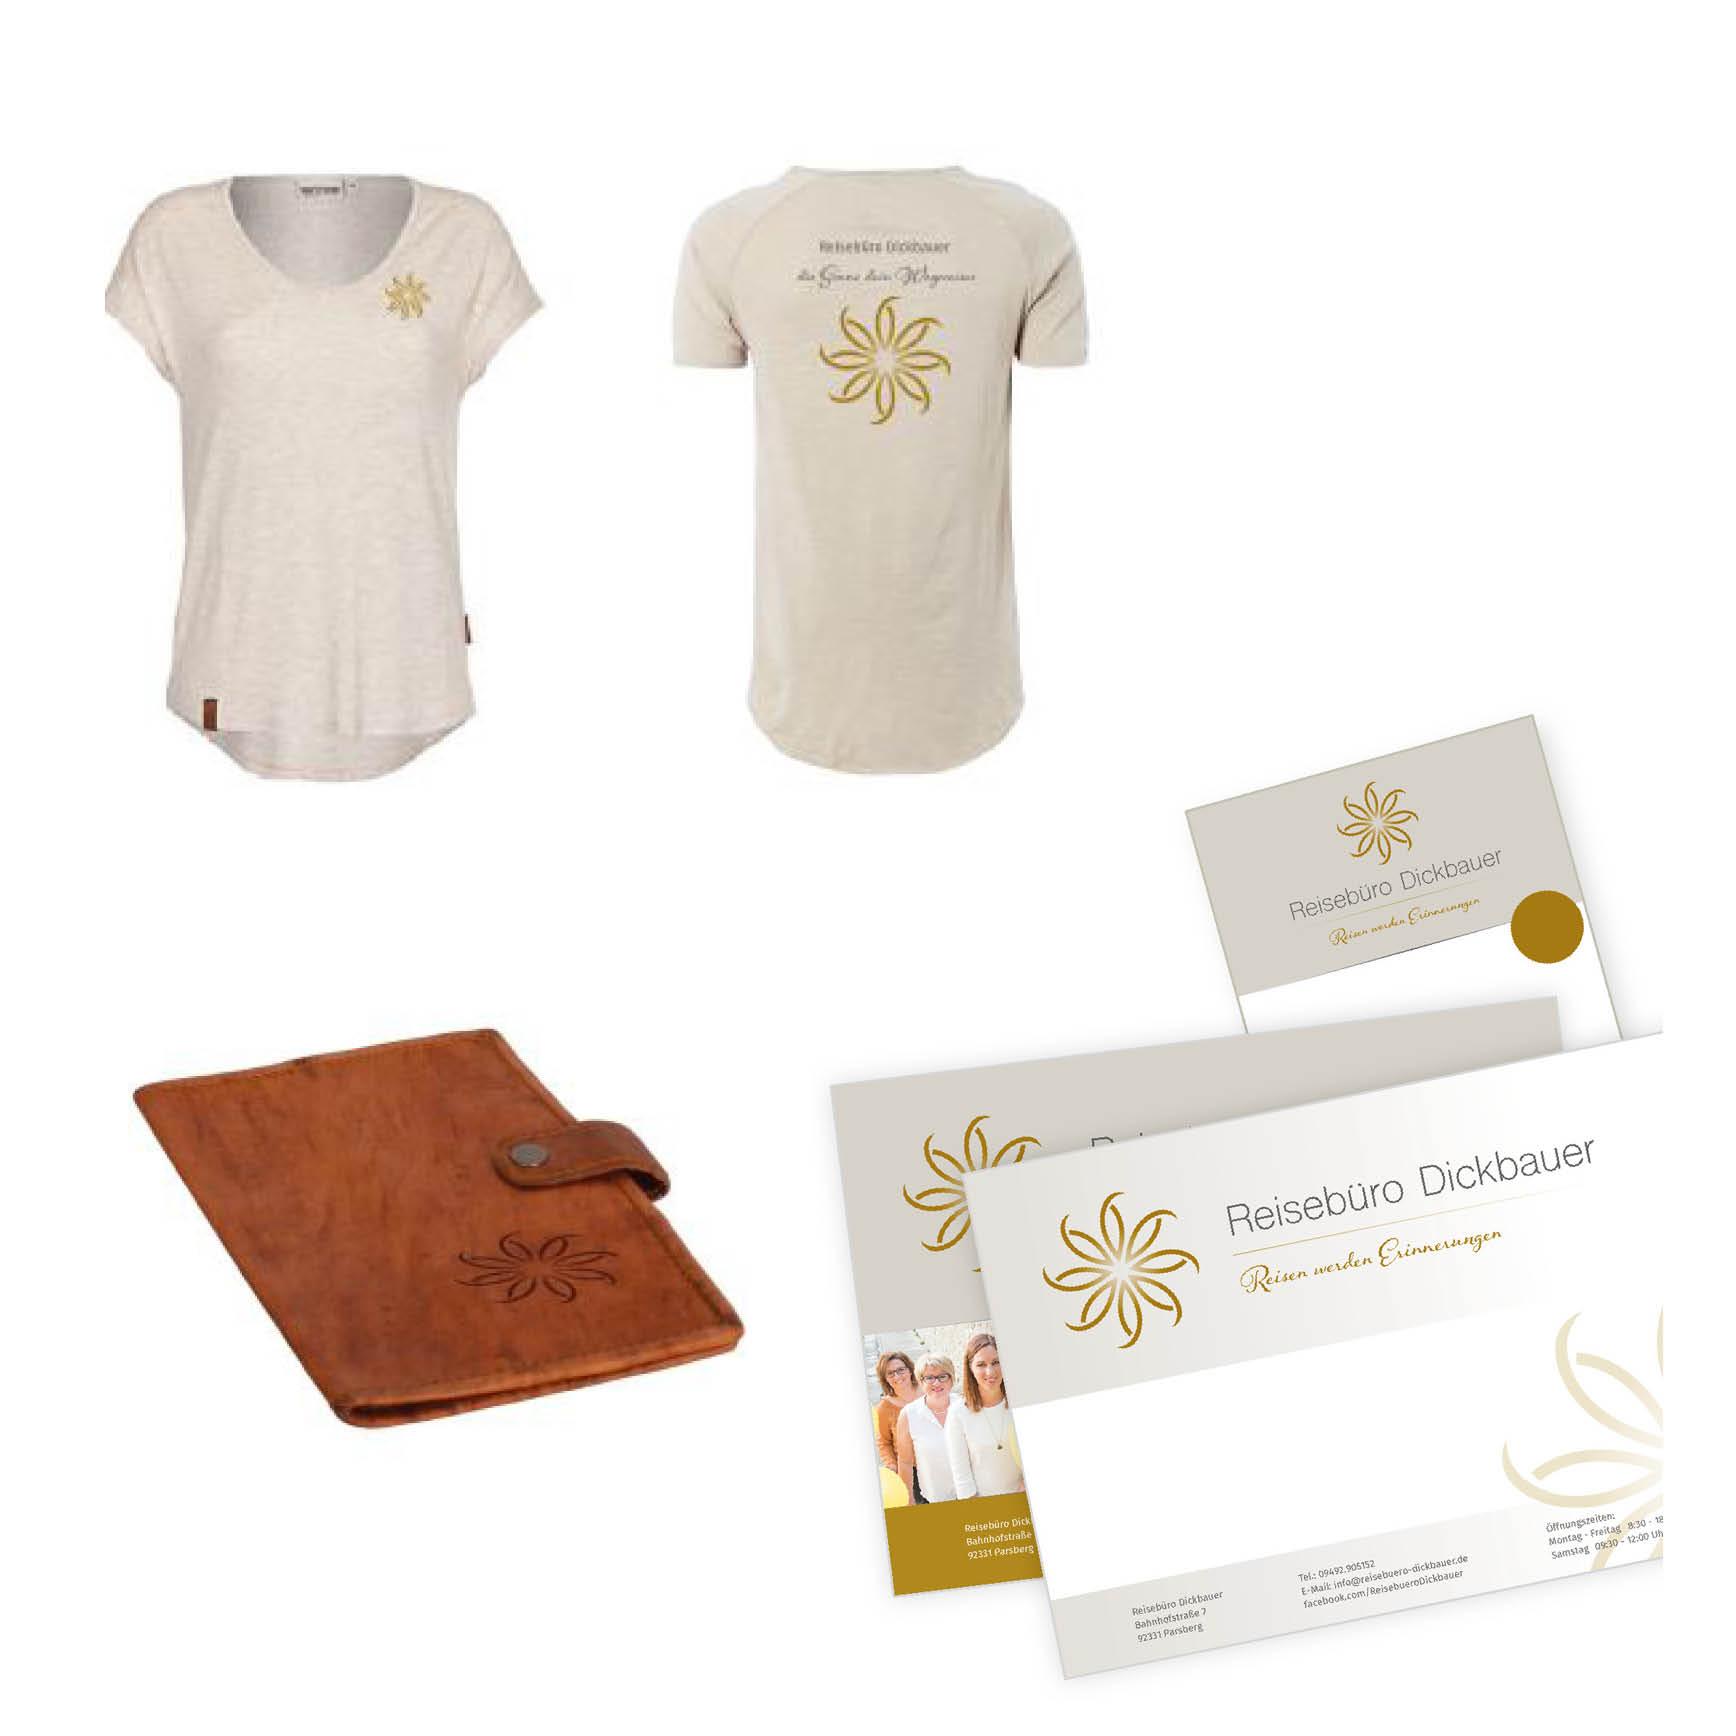 Geschäftsausstattung und Shirts